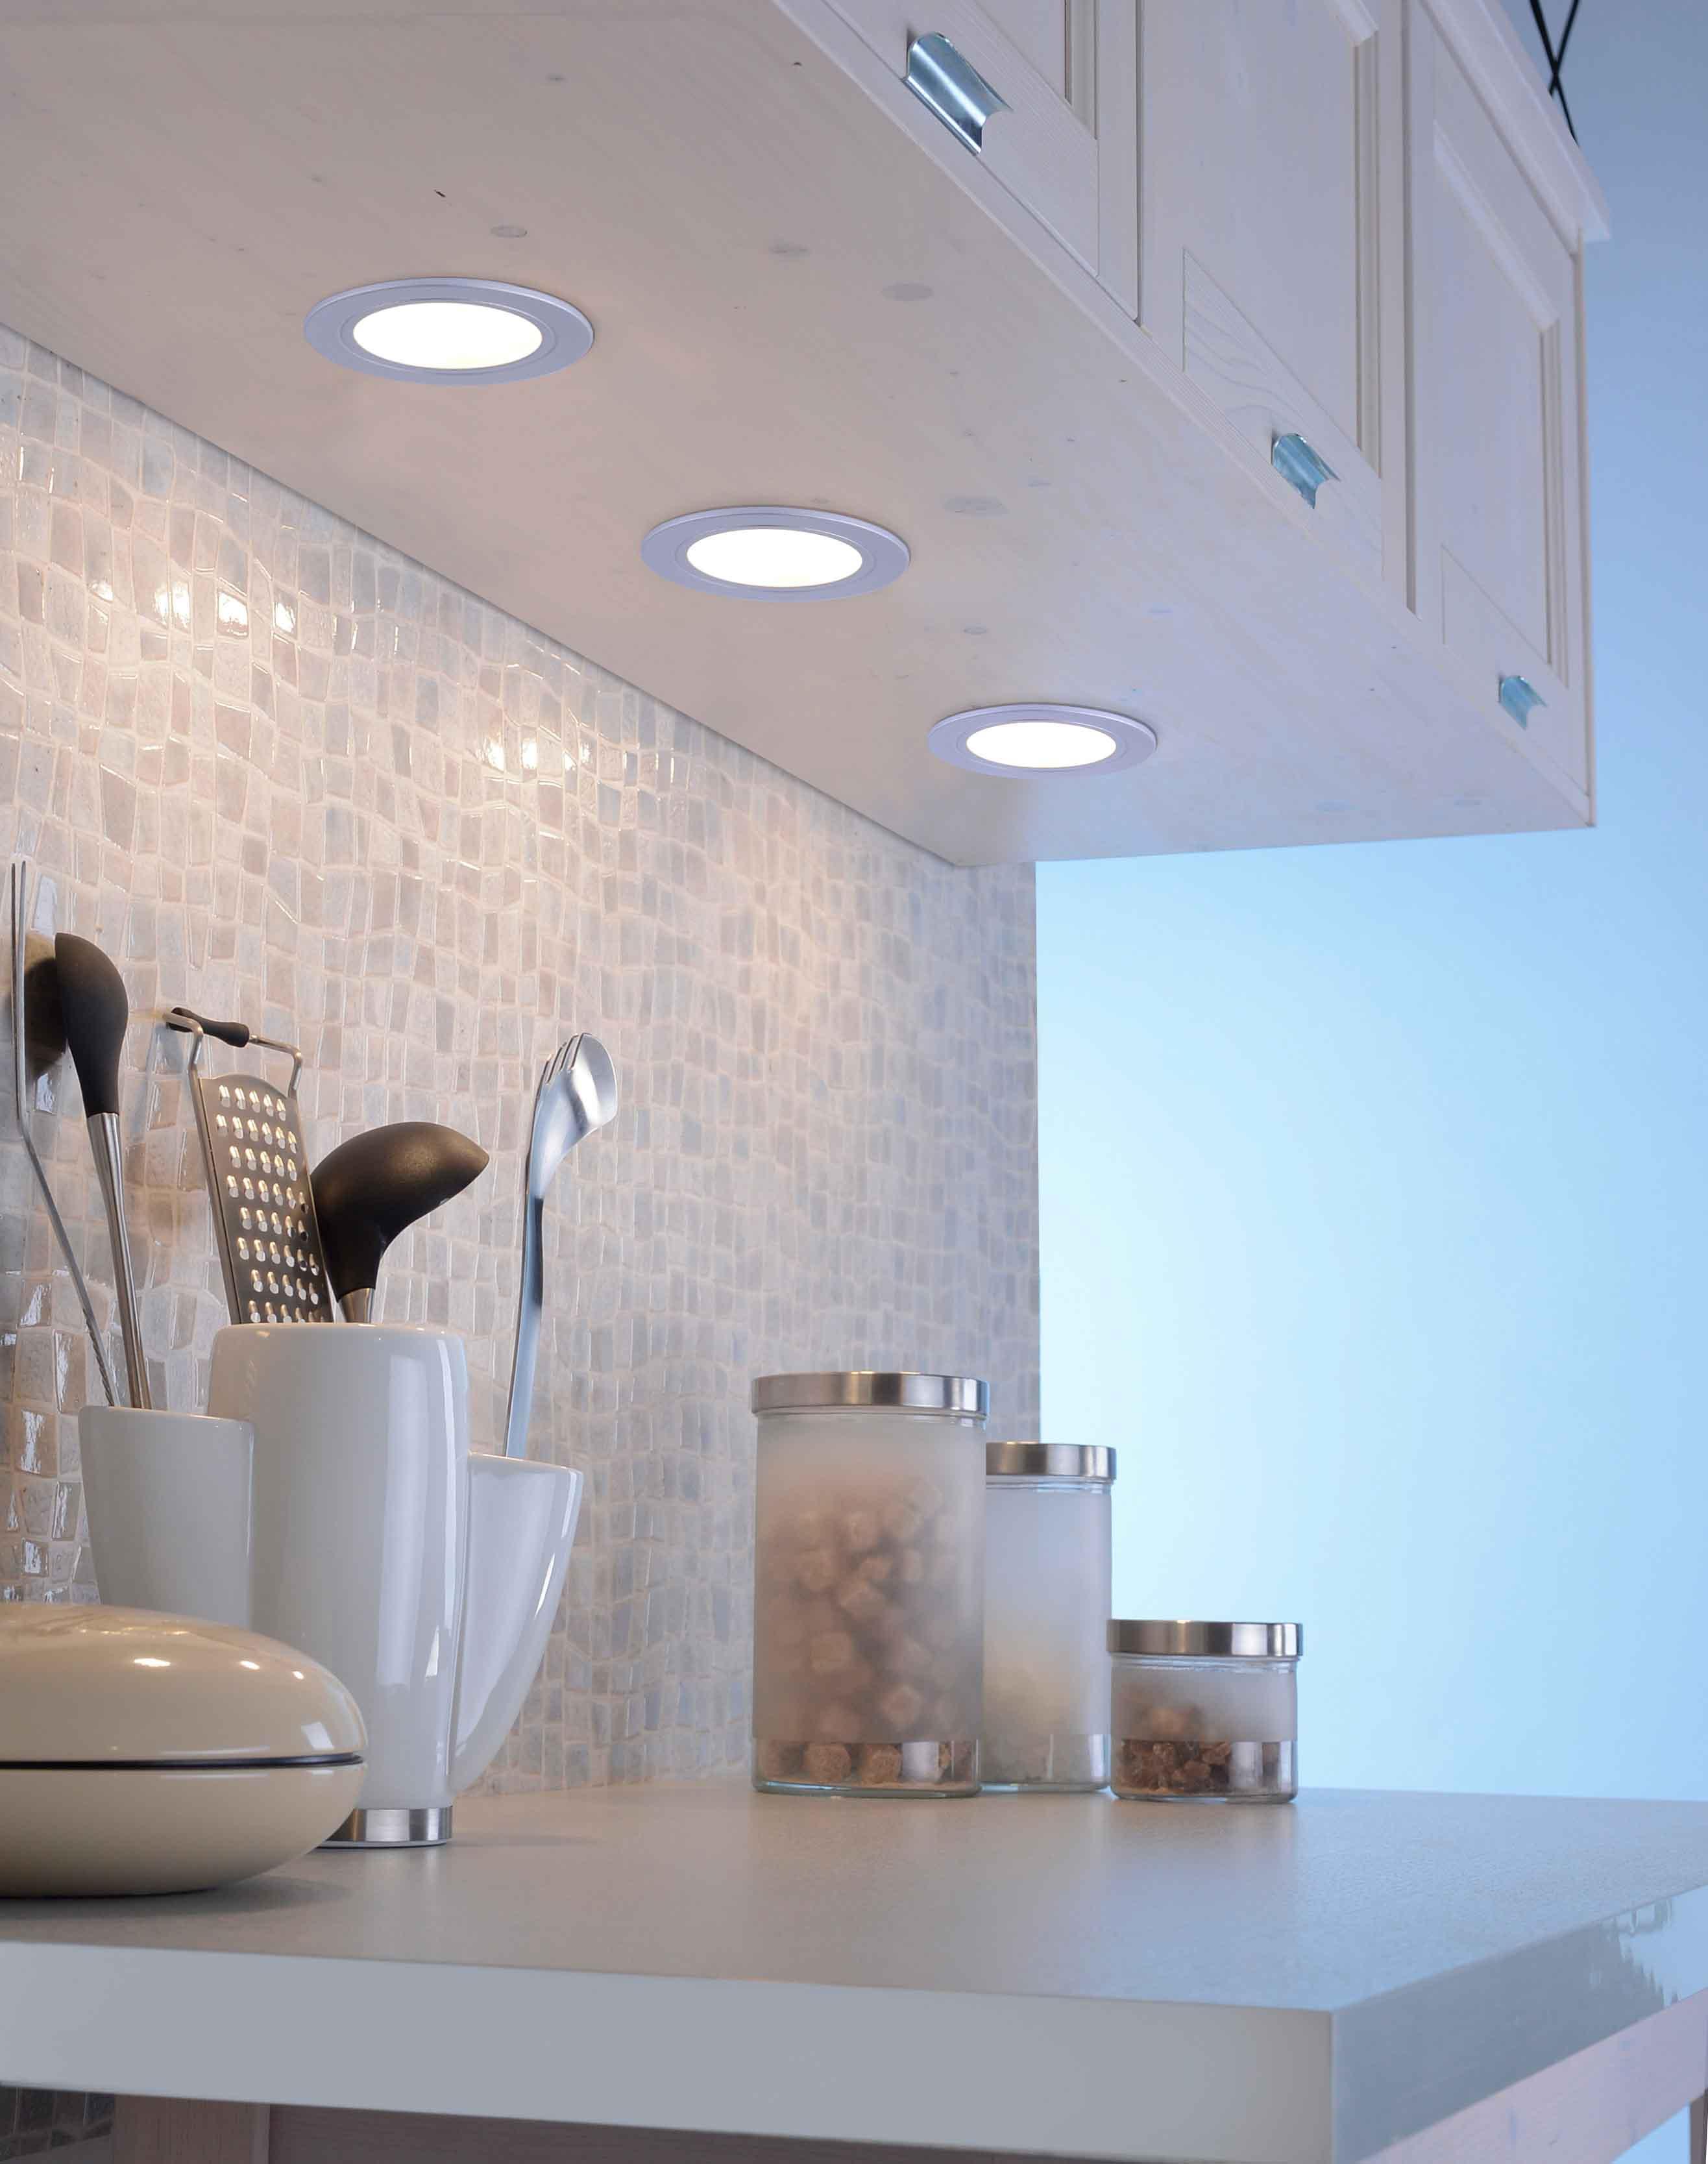 Q-ELLI Einbauleuchten, 3er Set, Smart Home, dimmbar, Ø 5,4 cm